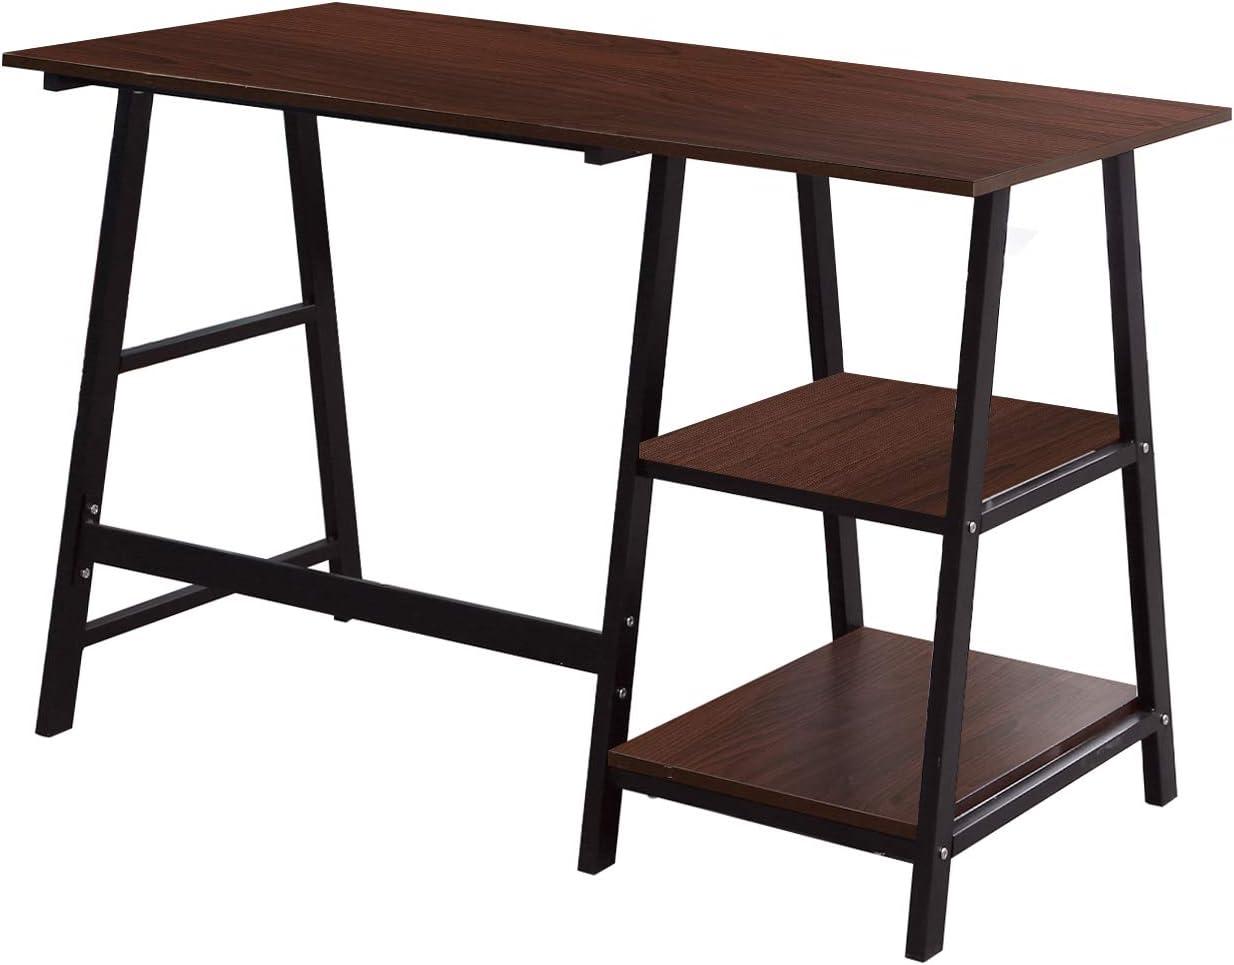 Soges Computer Desk Trestle Desk Writing Home Office Desk Hutch Workstation with Shelf, Walnut & Black 47 Inches CS-Tplus-120WB